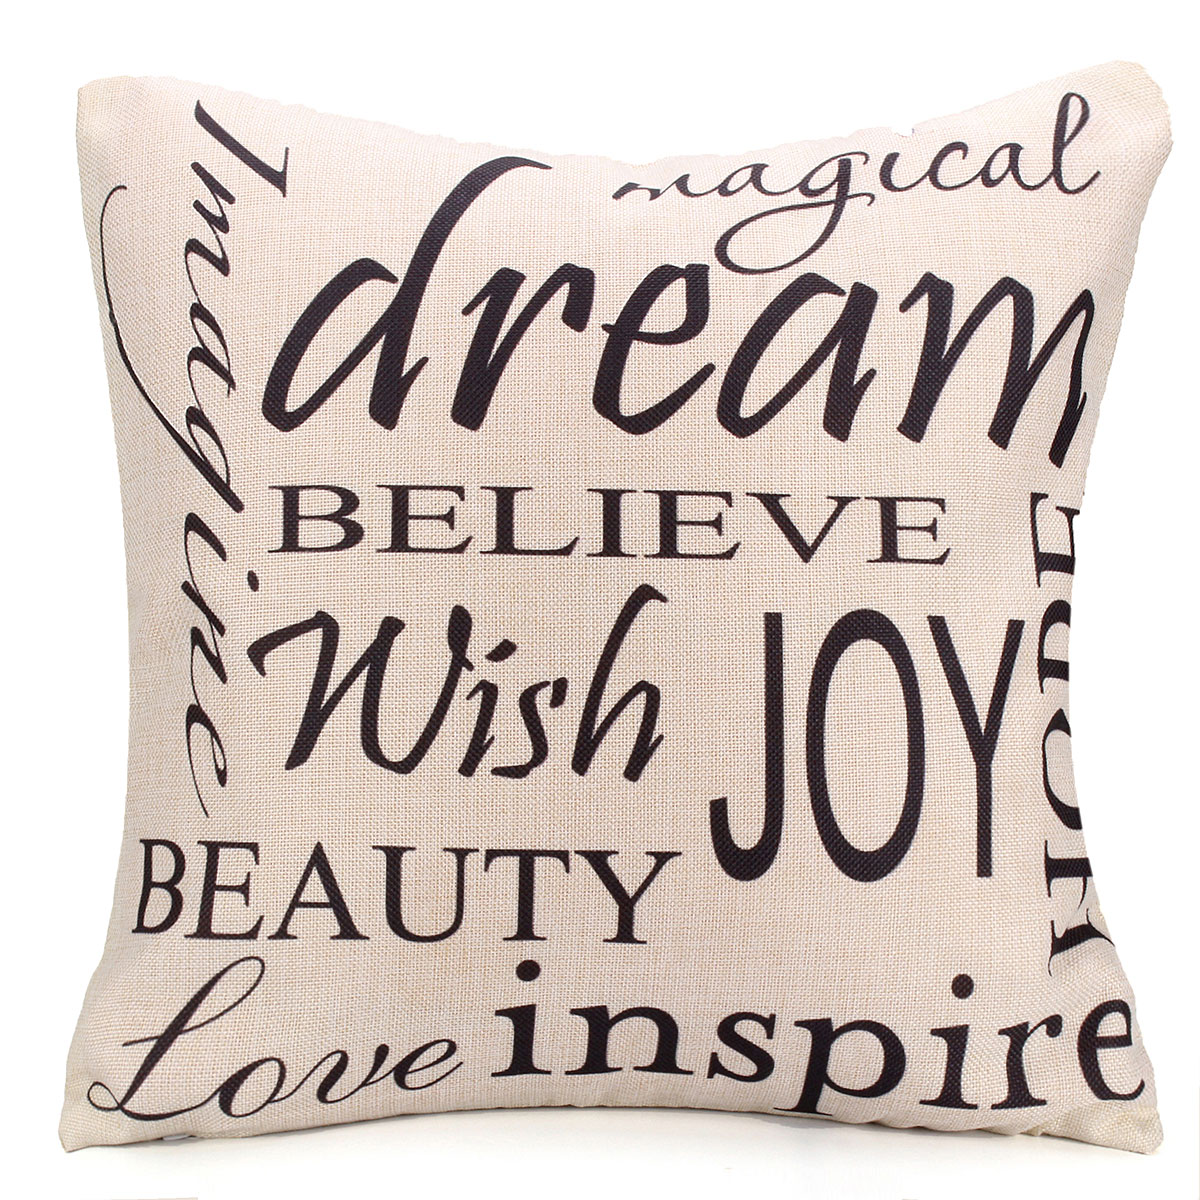 Square English Letter Cotton Linen Pillow Case Throw Cushion Cover Home Decor